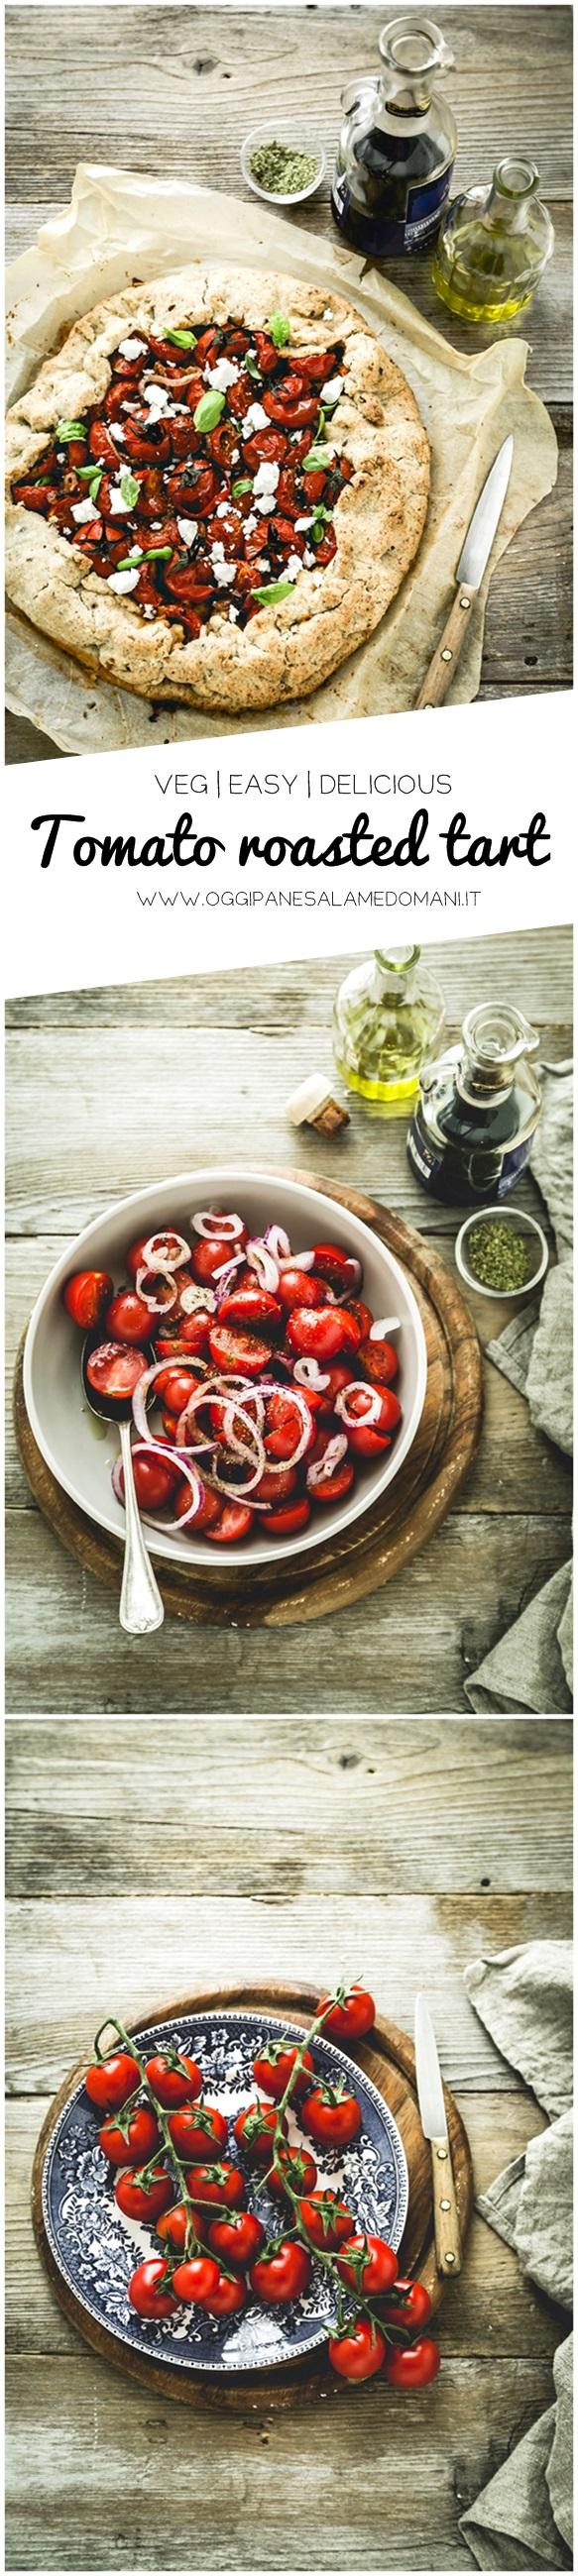 torta salata ai pomodori - tart ai pomodori - roasted tomato tart